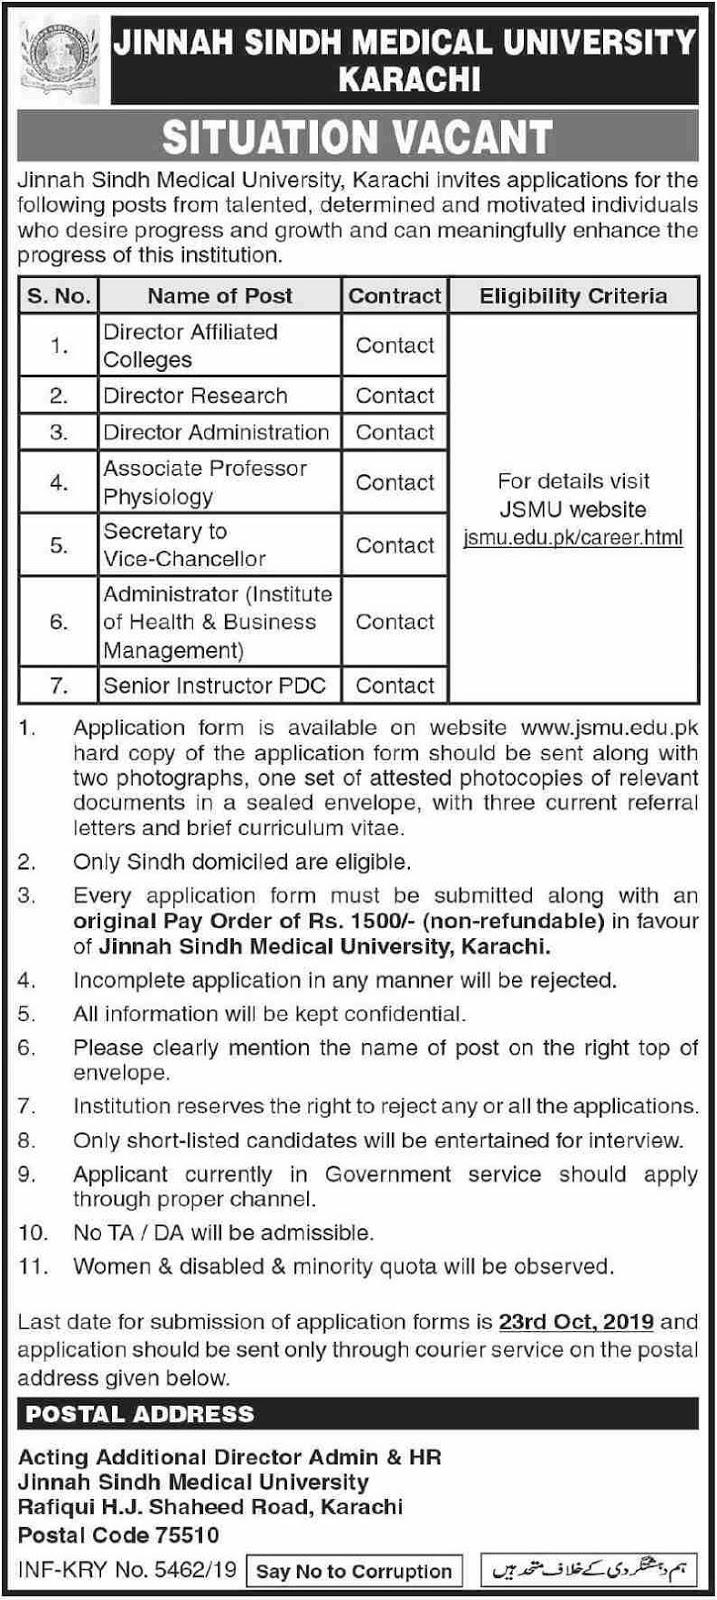 JSMU Jinnah Sindh Medical University Karachi Jobs 2019